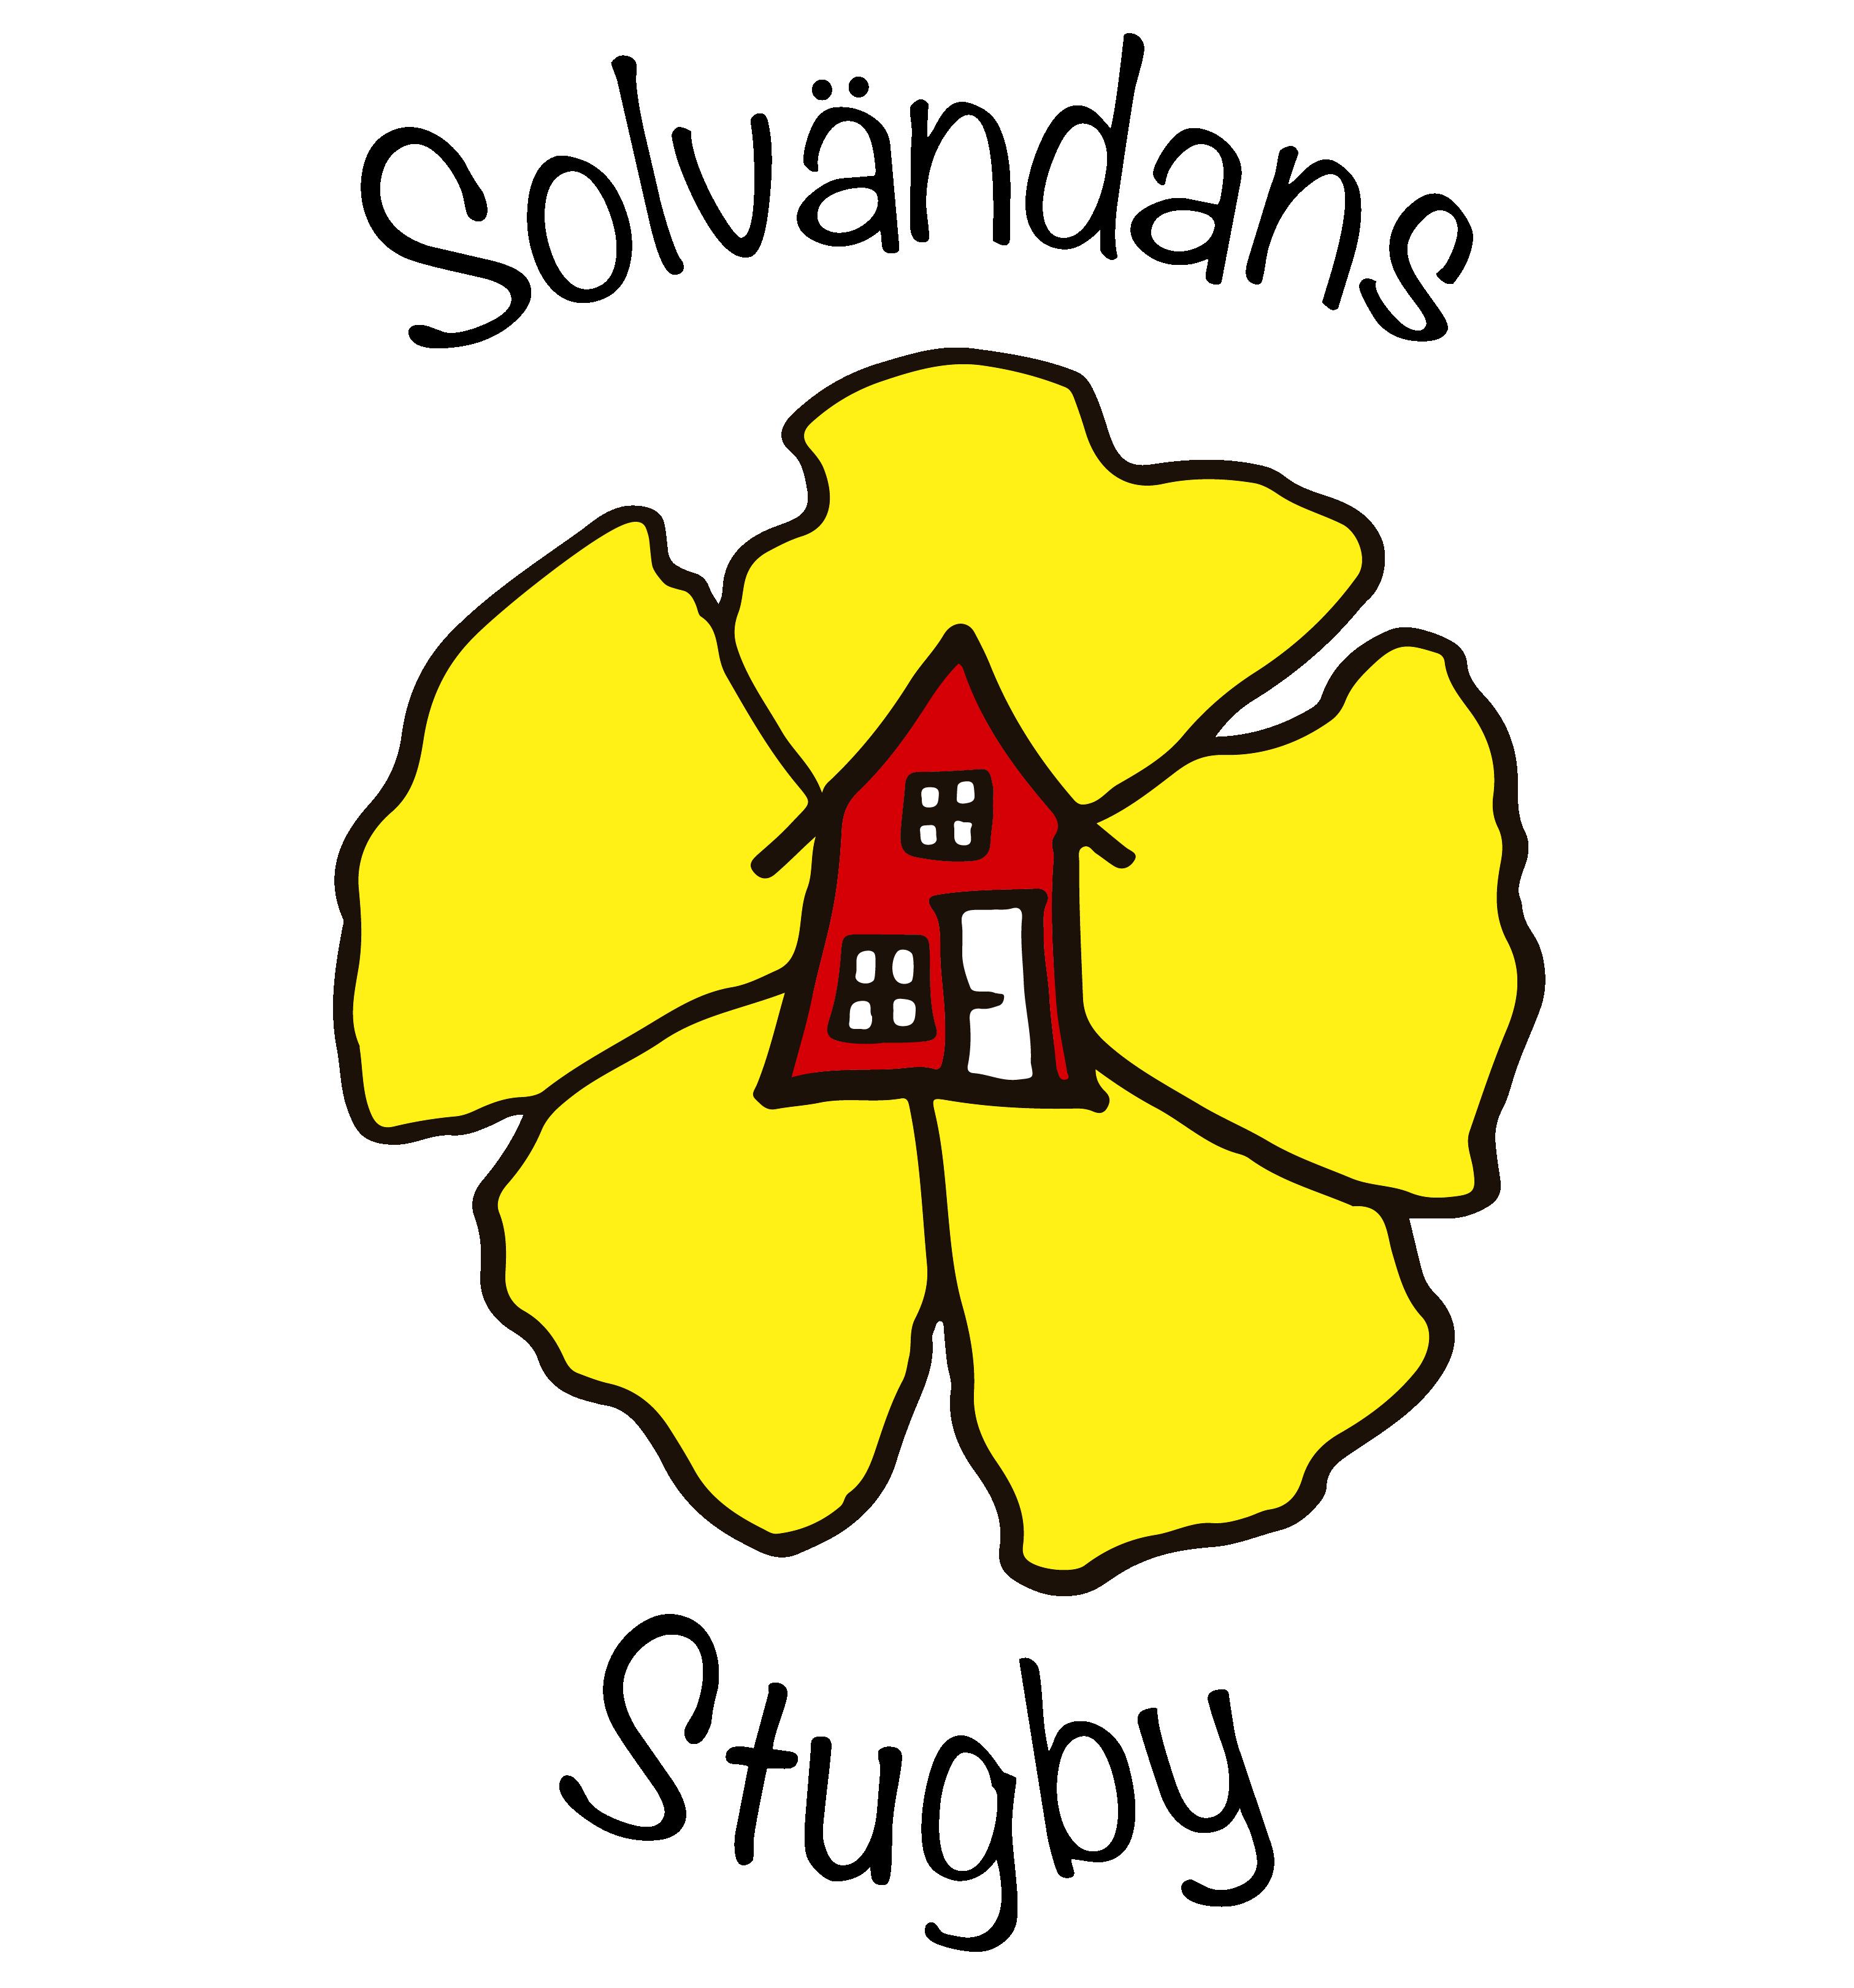 Solvändans Stugby